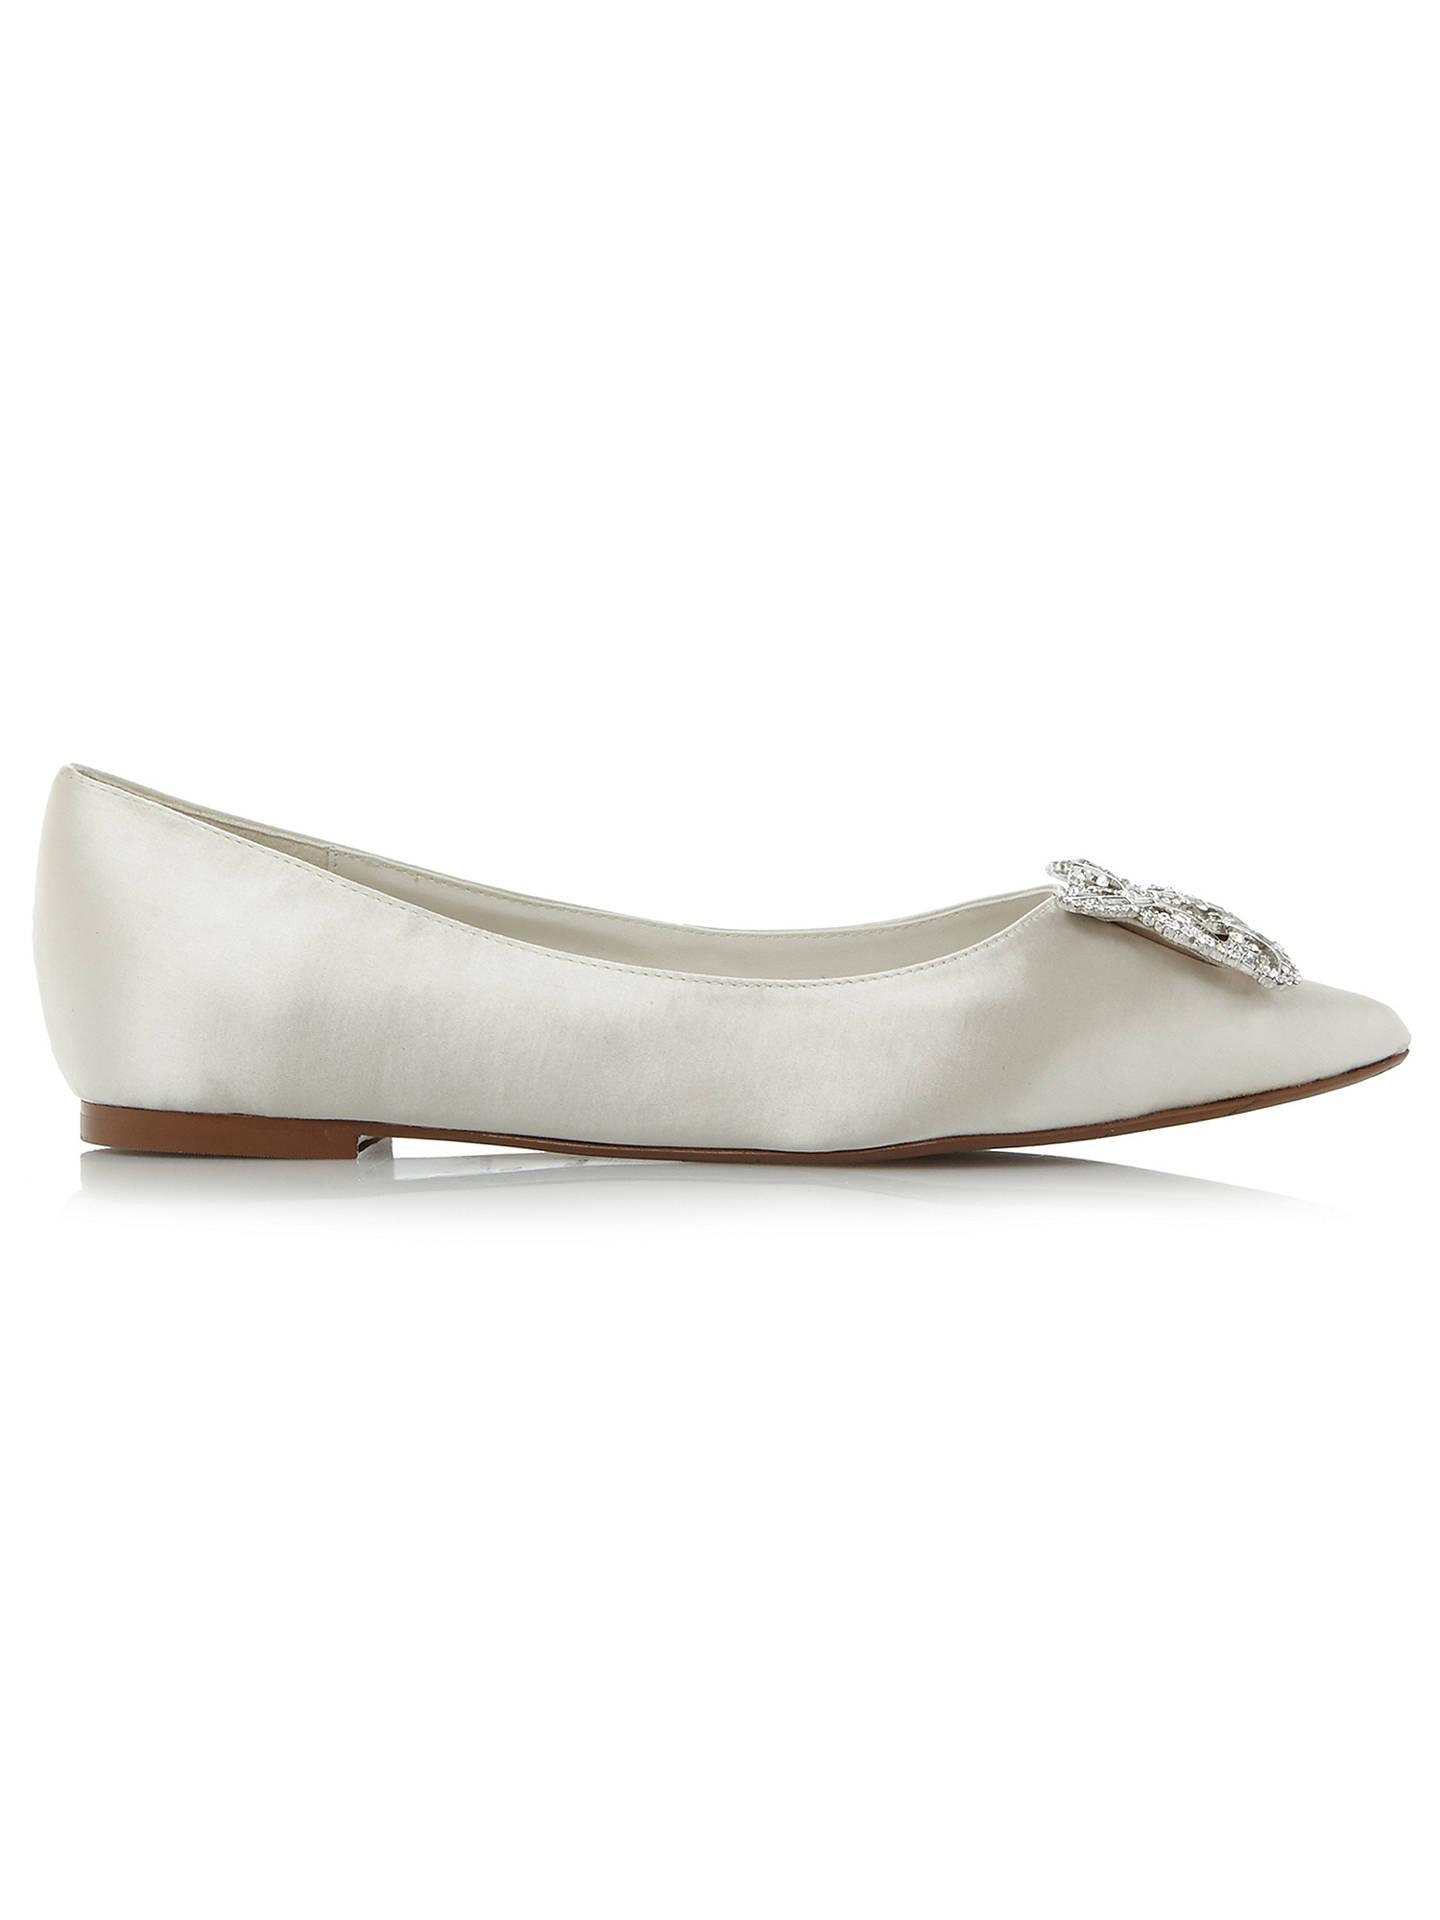 e449b94a8 Buy Dune Bridal Collection Briella Jewel Ballet Pumps